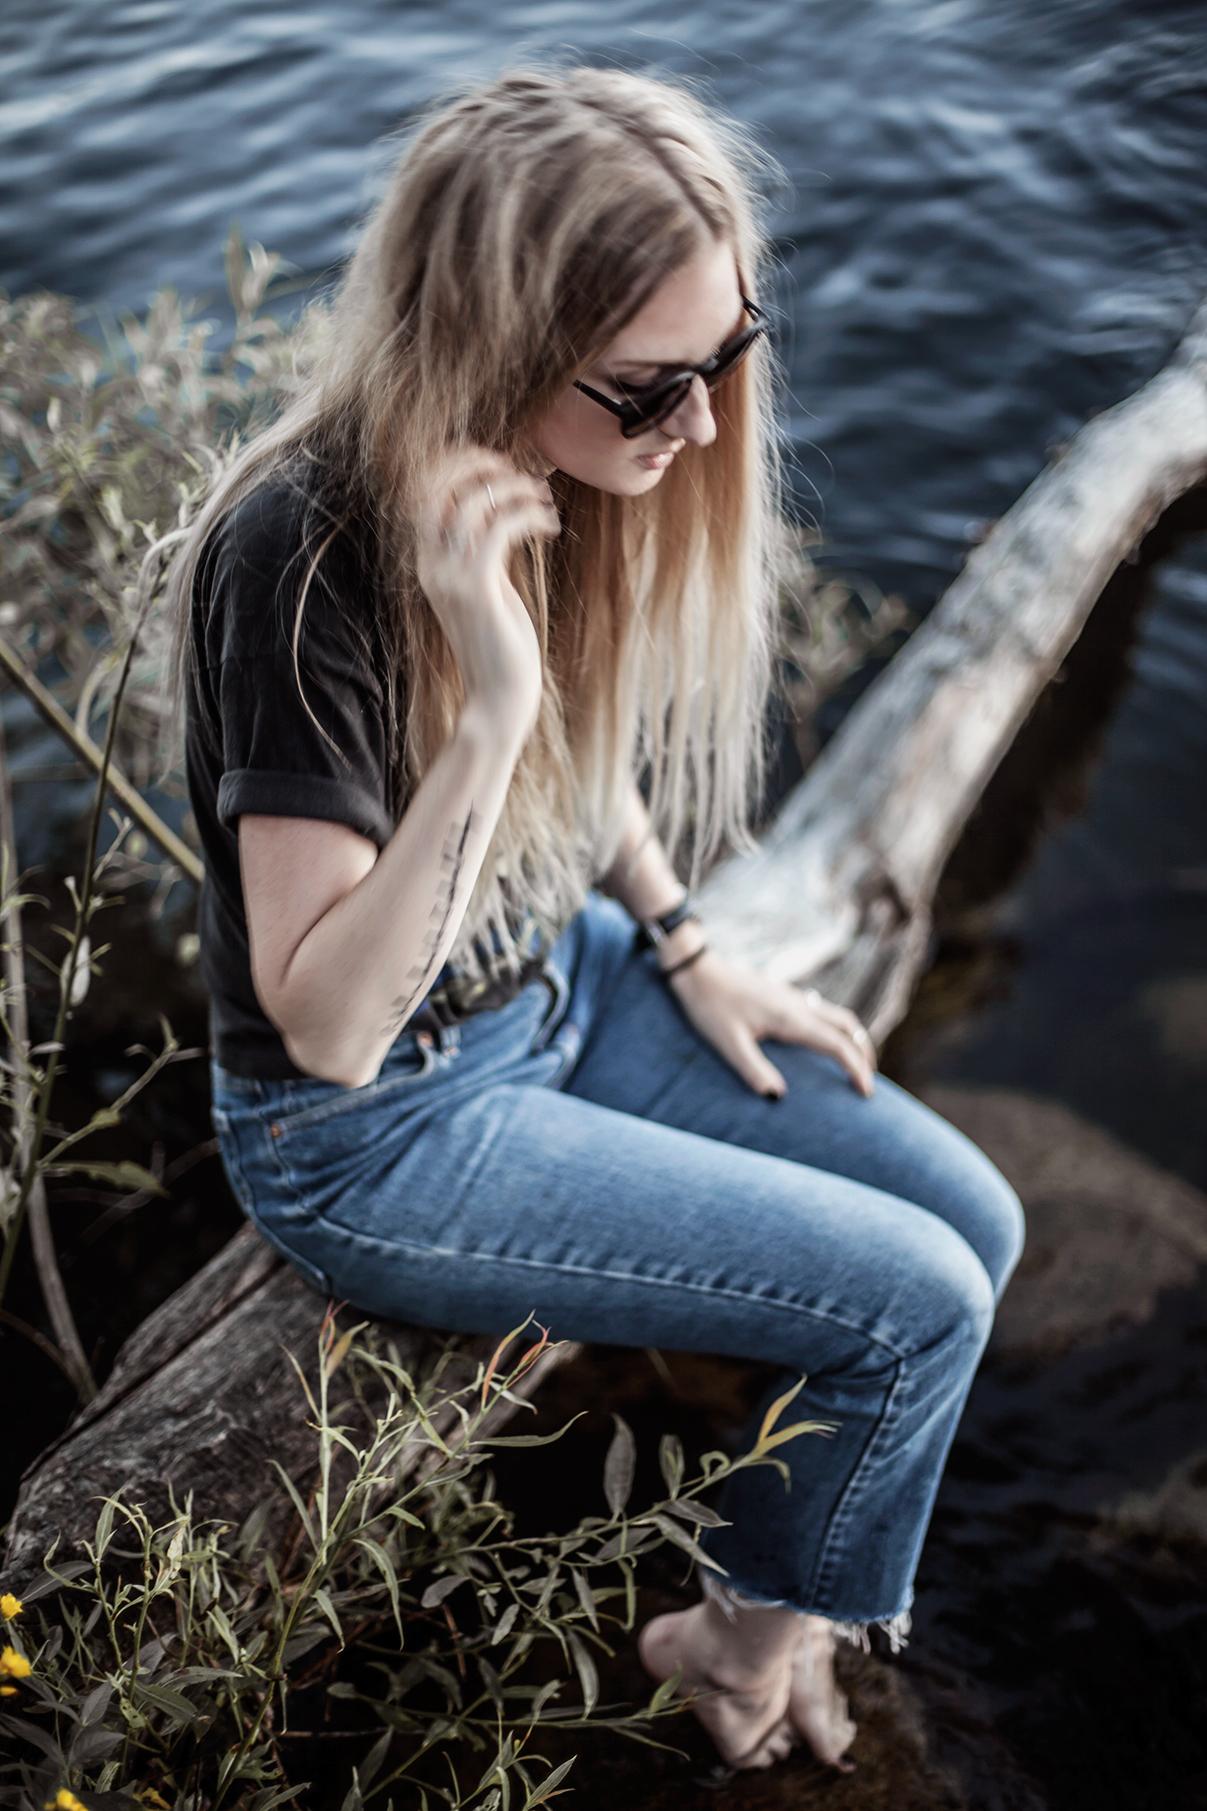 Anton Frans sunglasses copyright 2016 Anna Malmberg 1